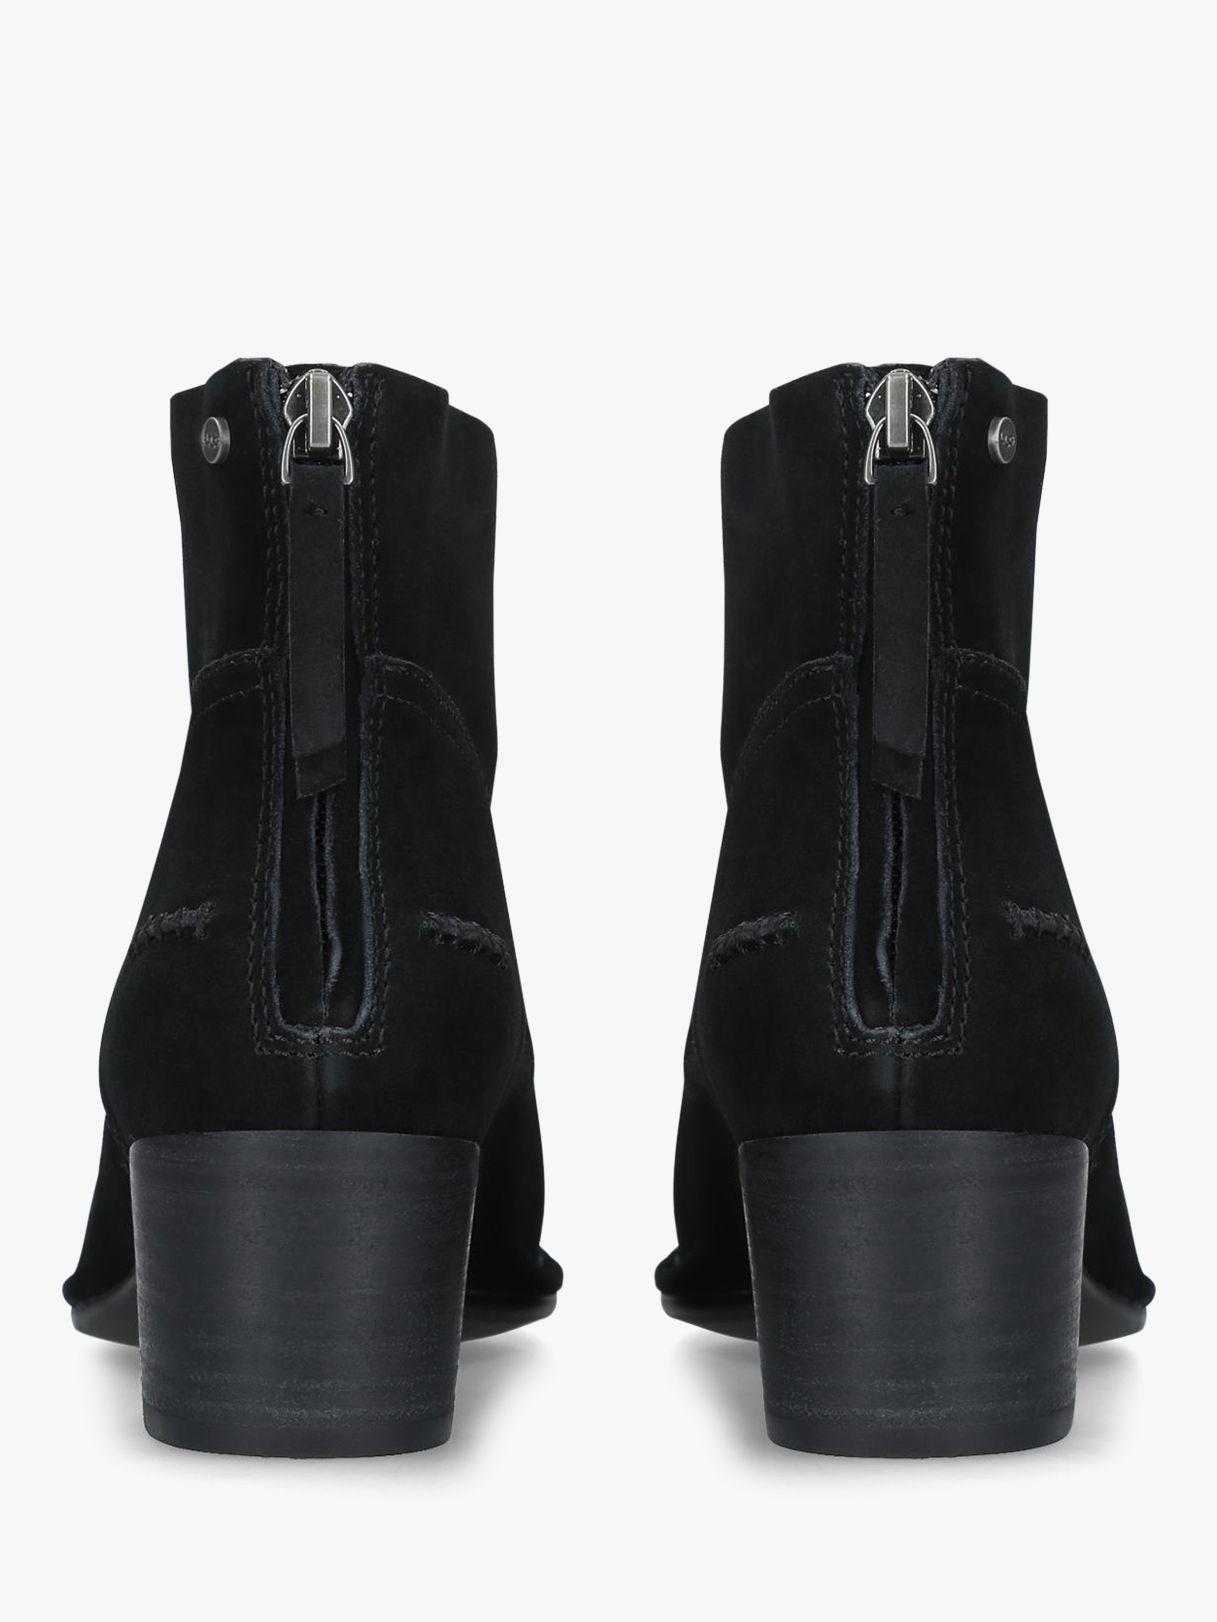 861e504f344 Ugg Black Bandara Block Heel Ankle Boots